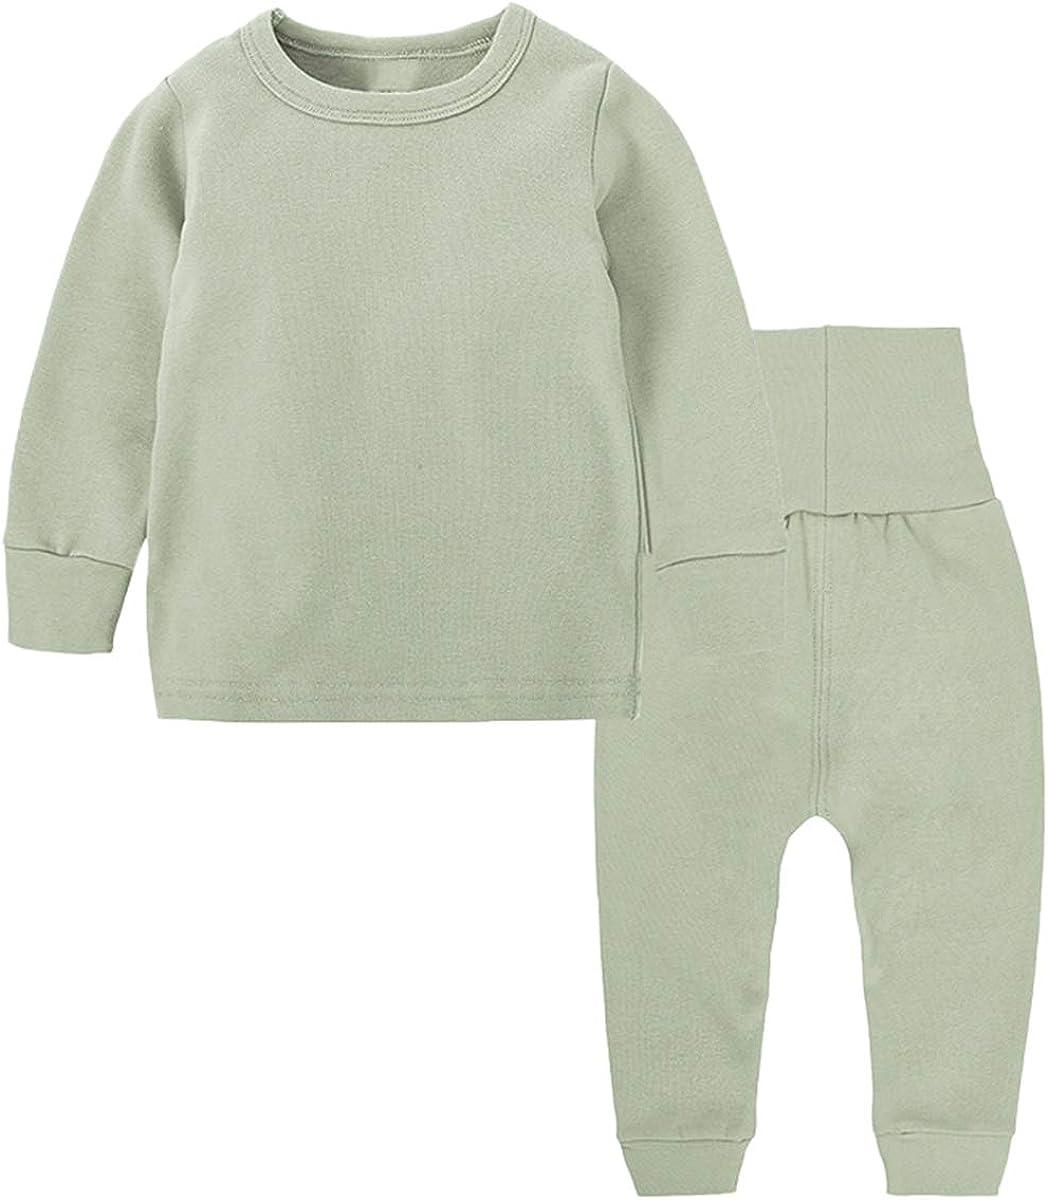 Toddler Boy's Thermal Underwear Set Base Layer Top & Bottom Set, Green, 11-12 Years = Tag 160